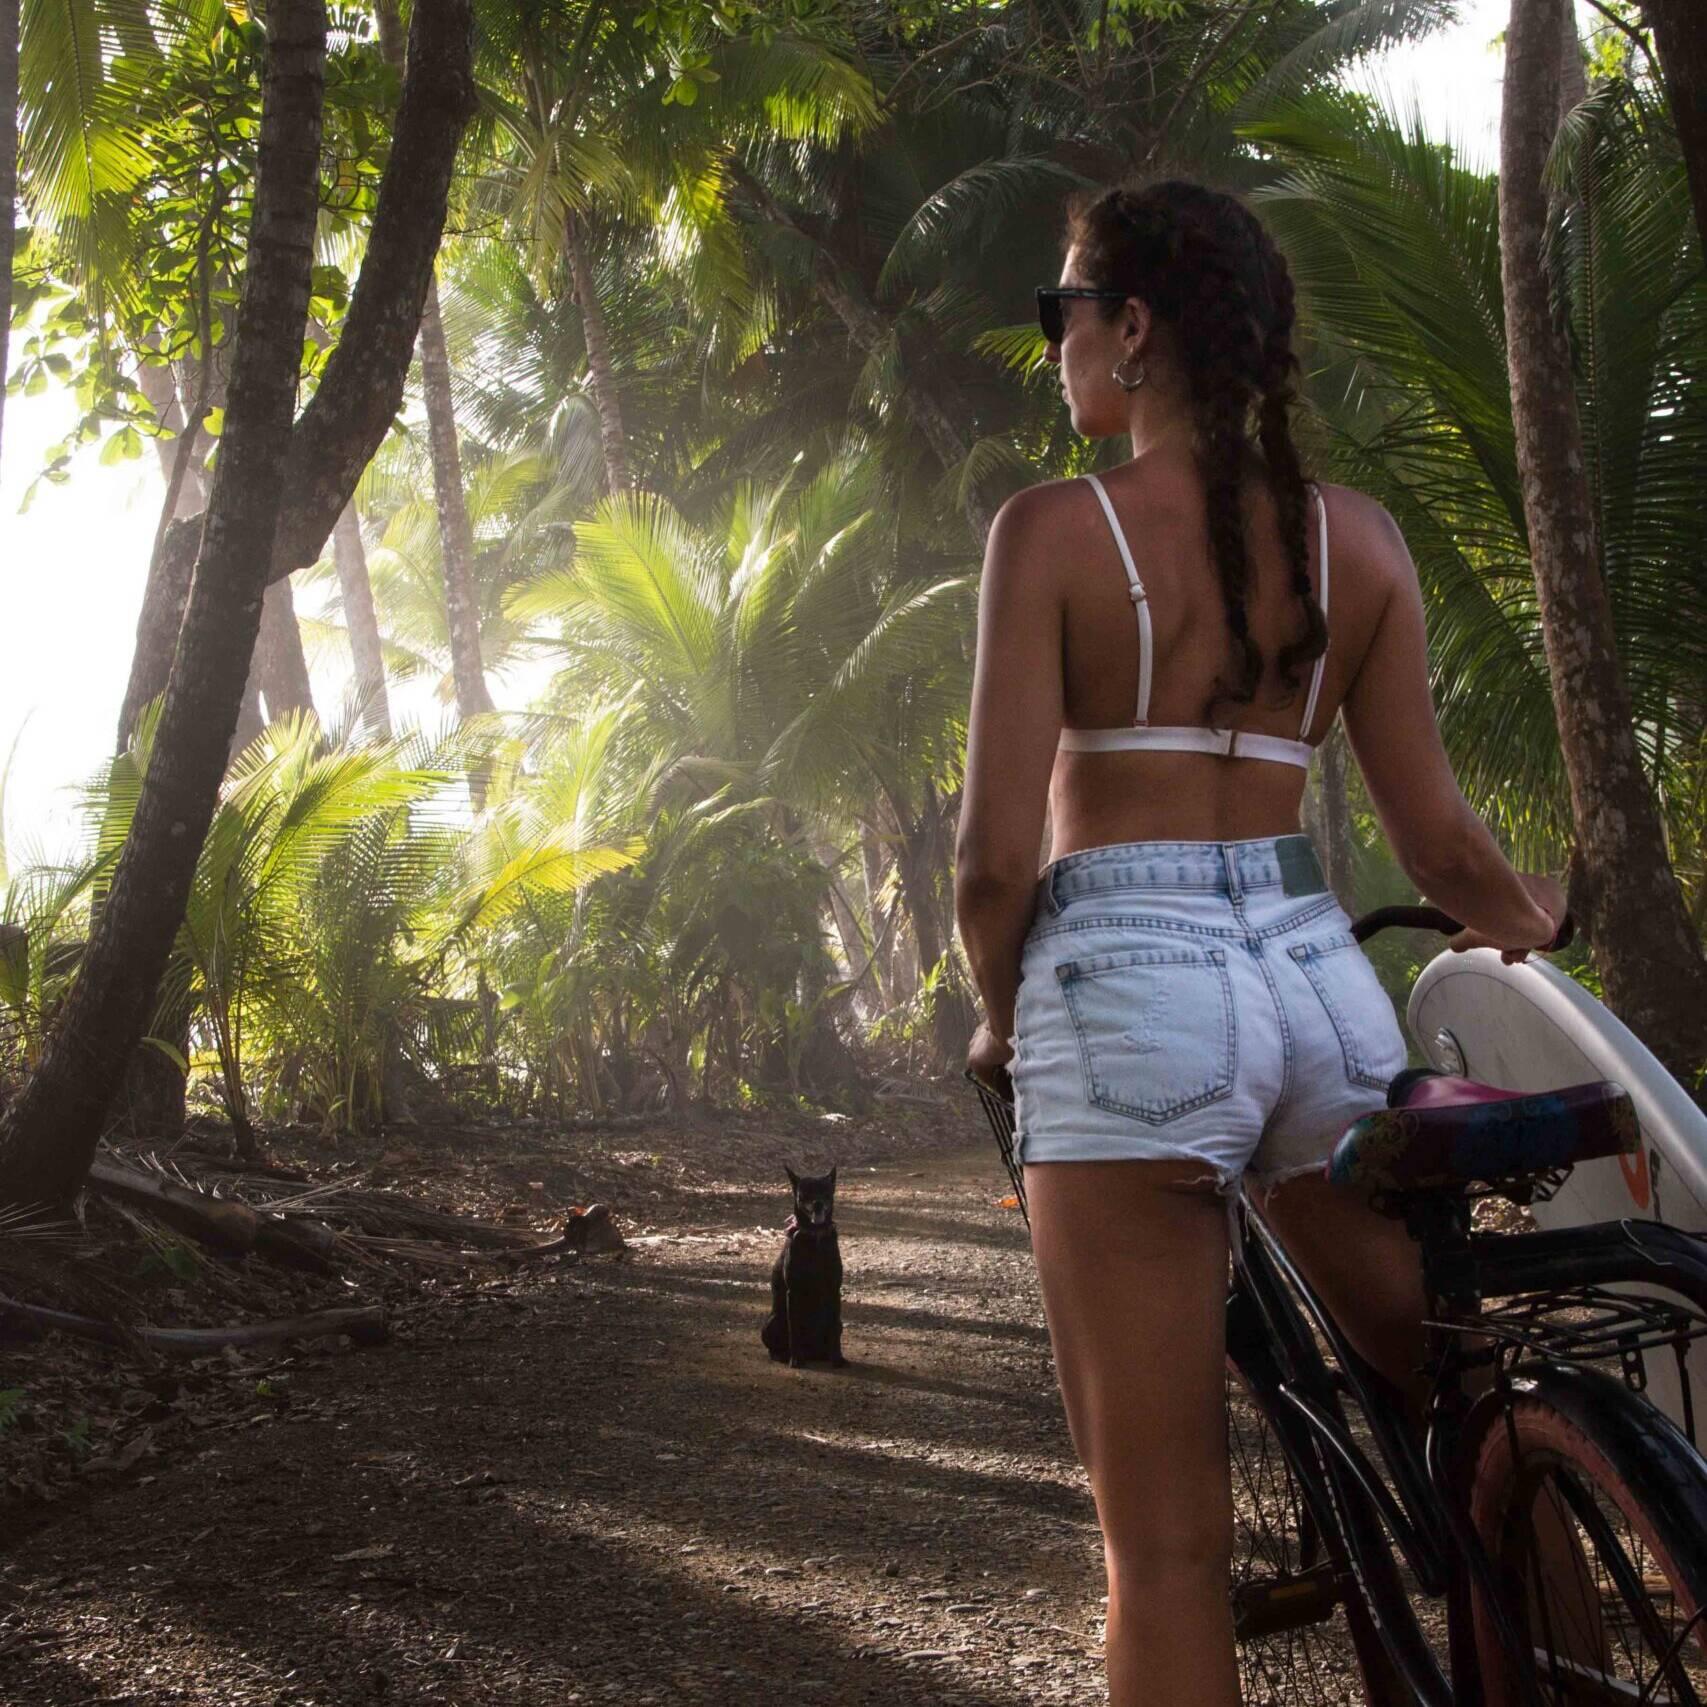 surfer girl bicycle rancho burica punta banco